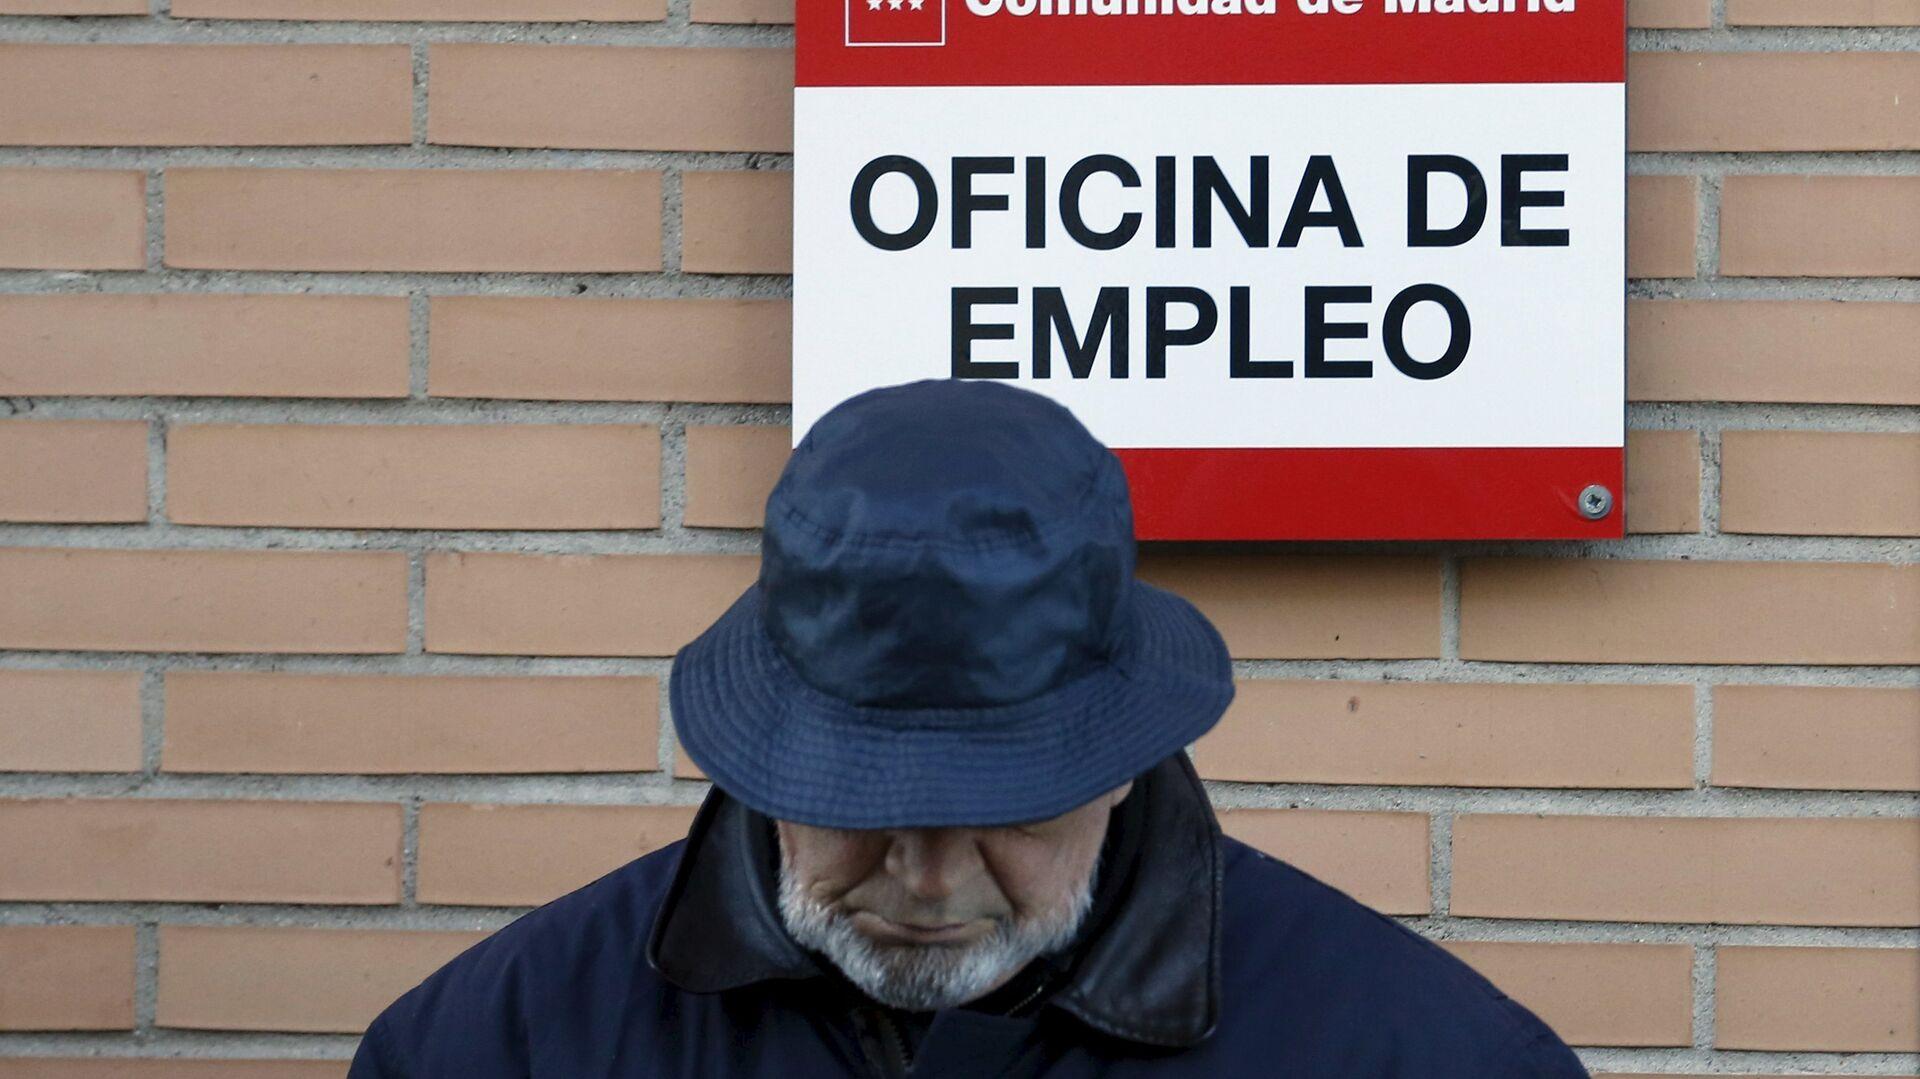 Un hombre cerca de la oficina de empleo en Madrid, España - Sputnik Mundo, 1920, 06.05.2021